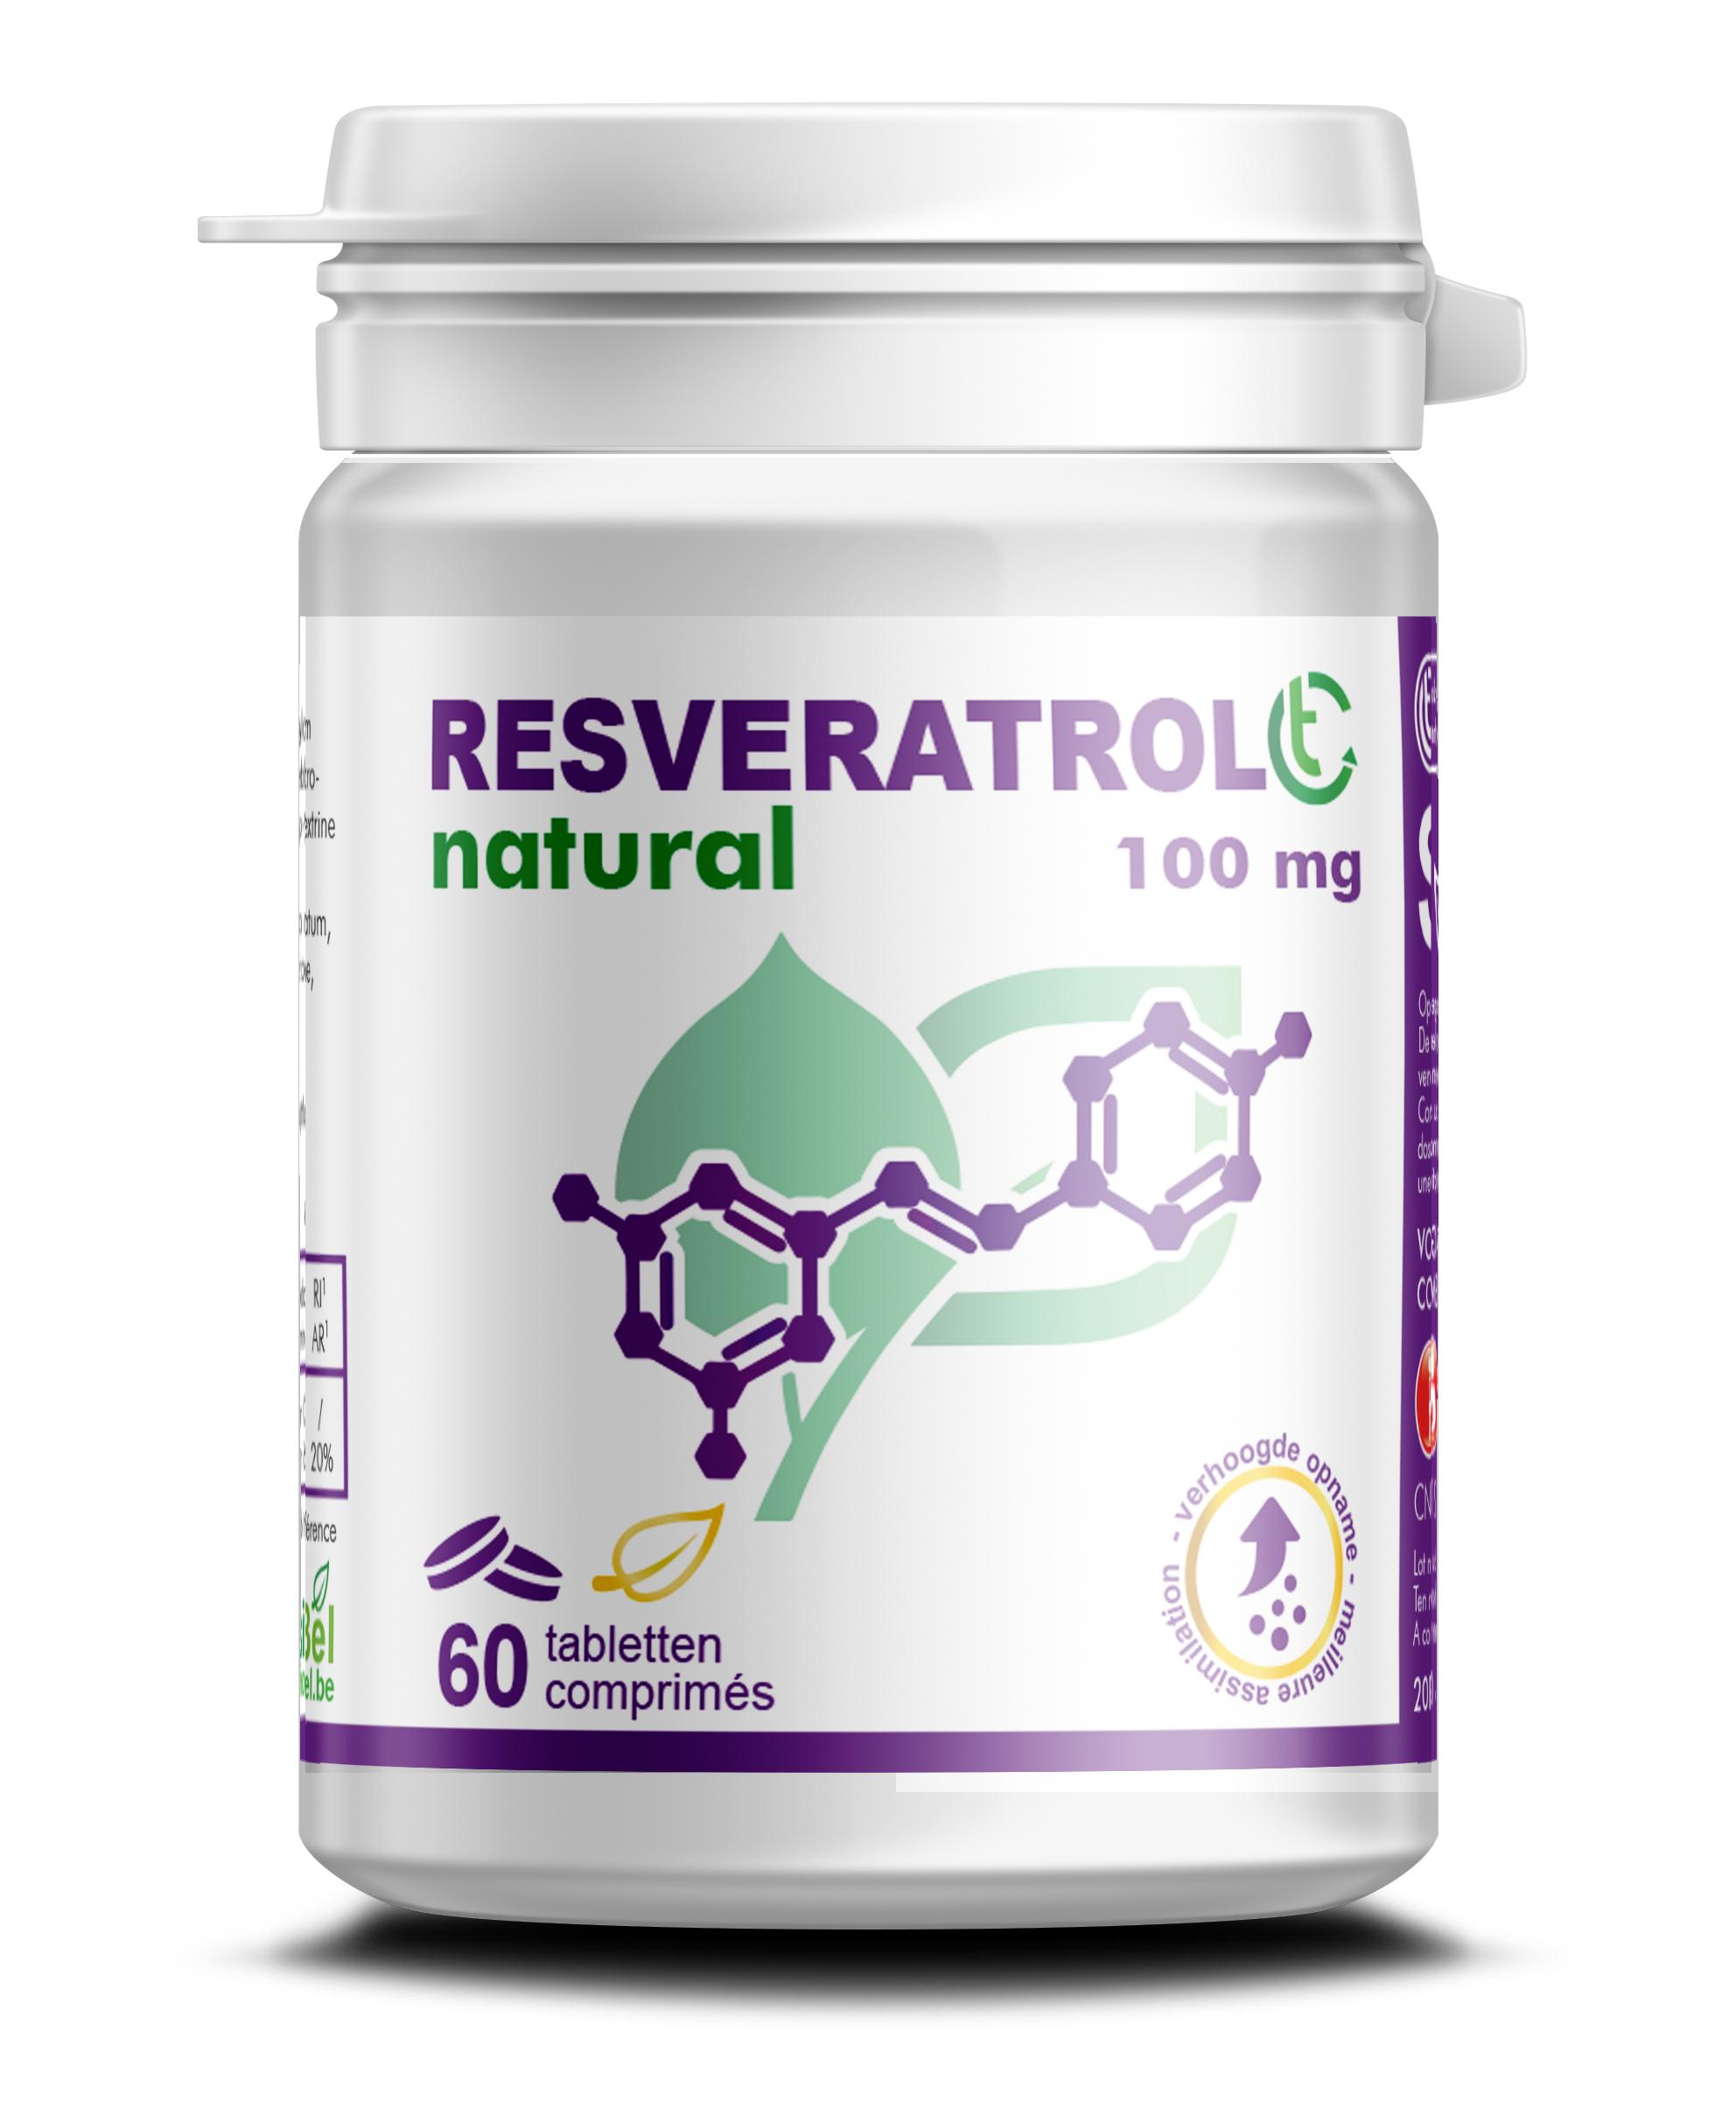 Resveratrol CT 100 mg